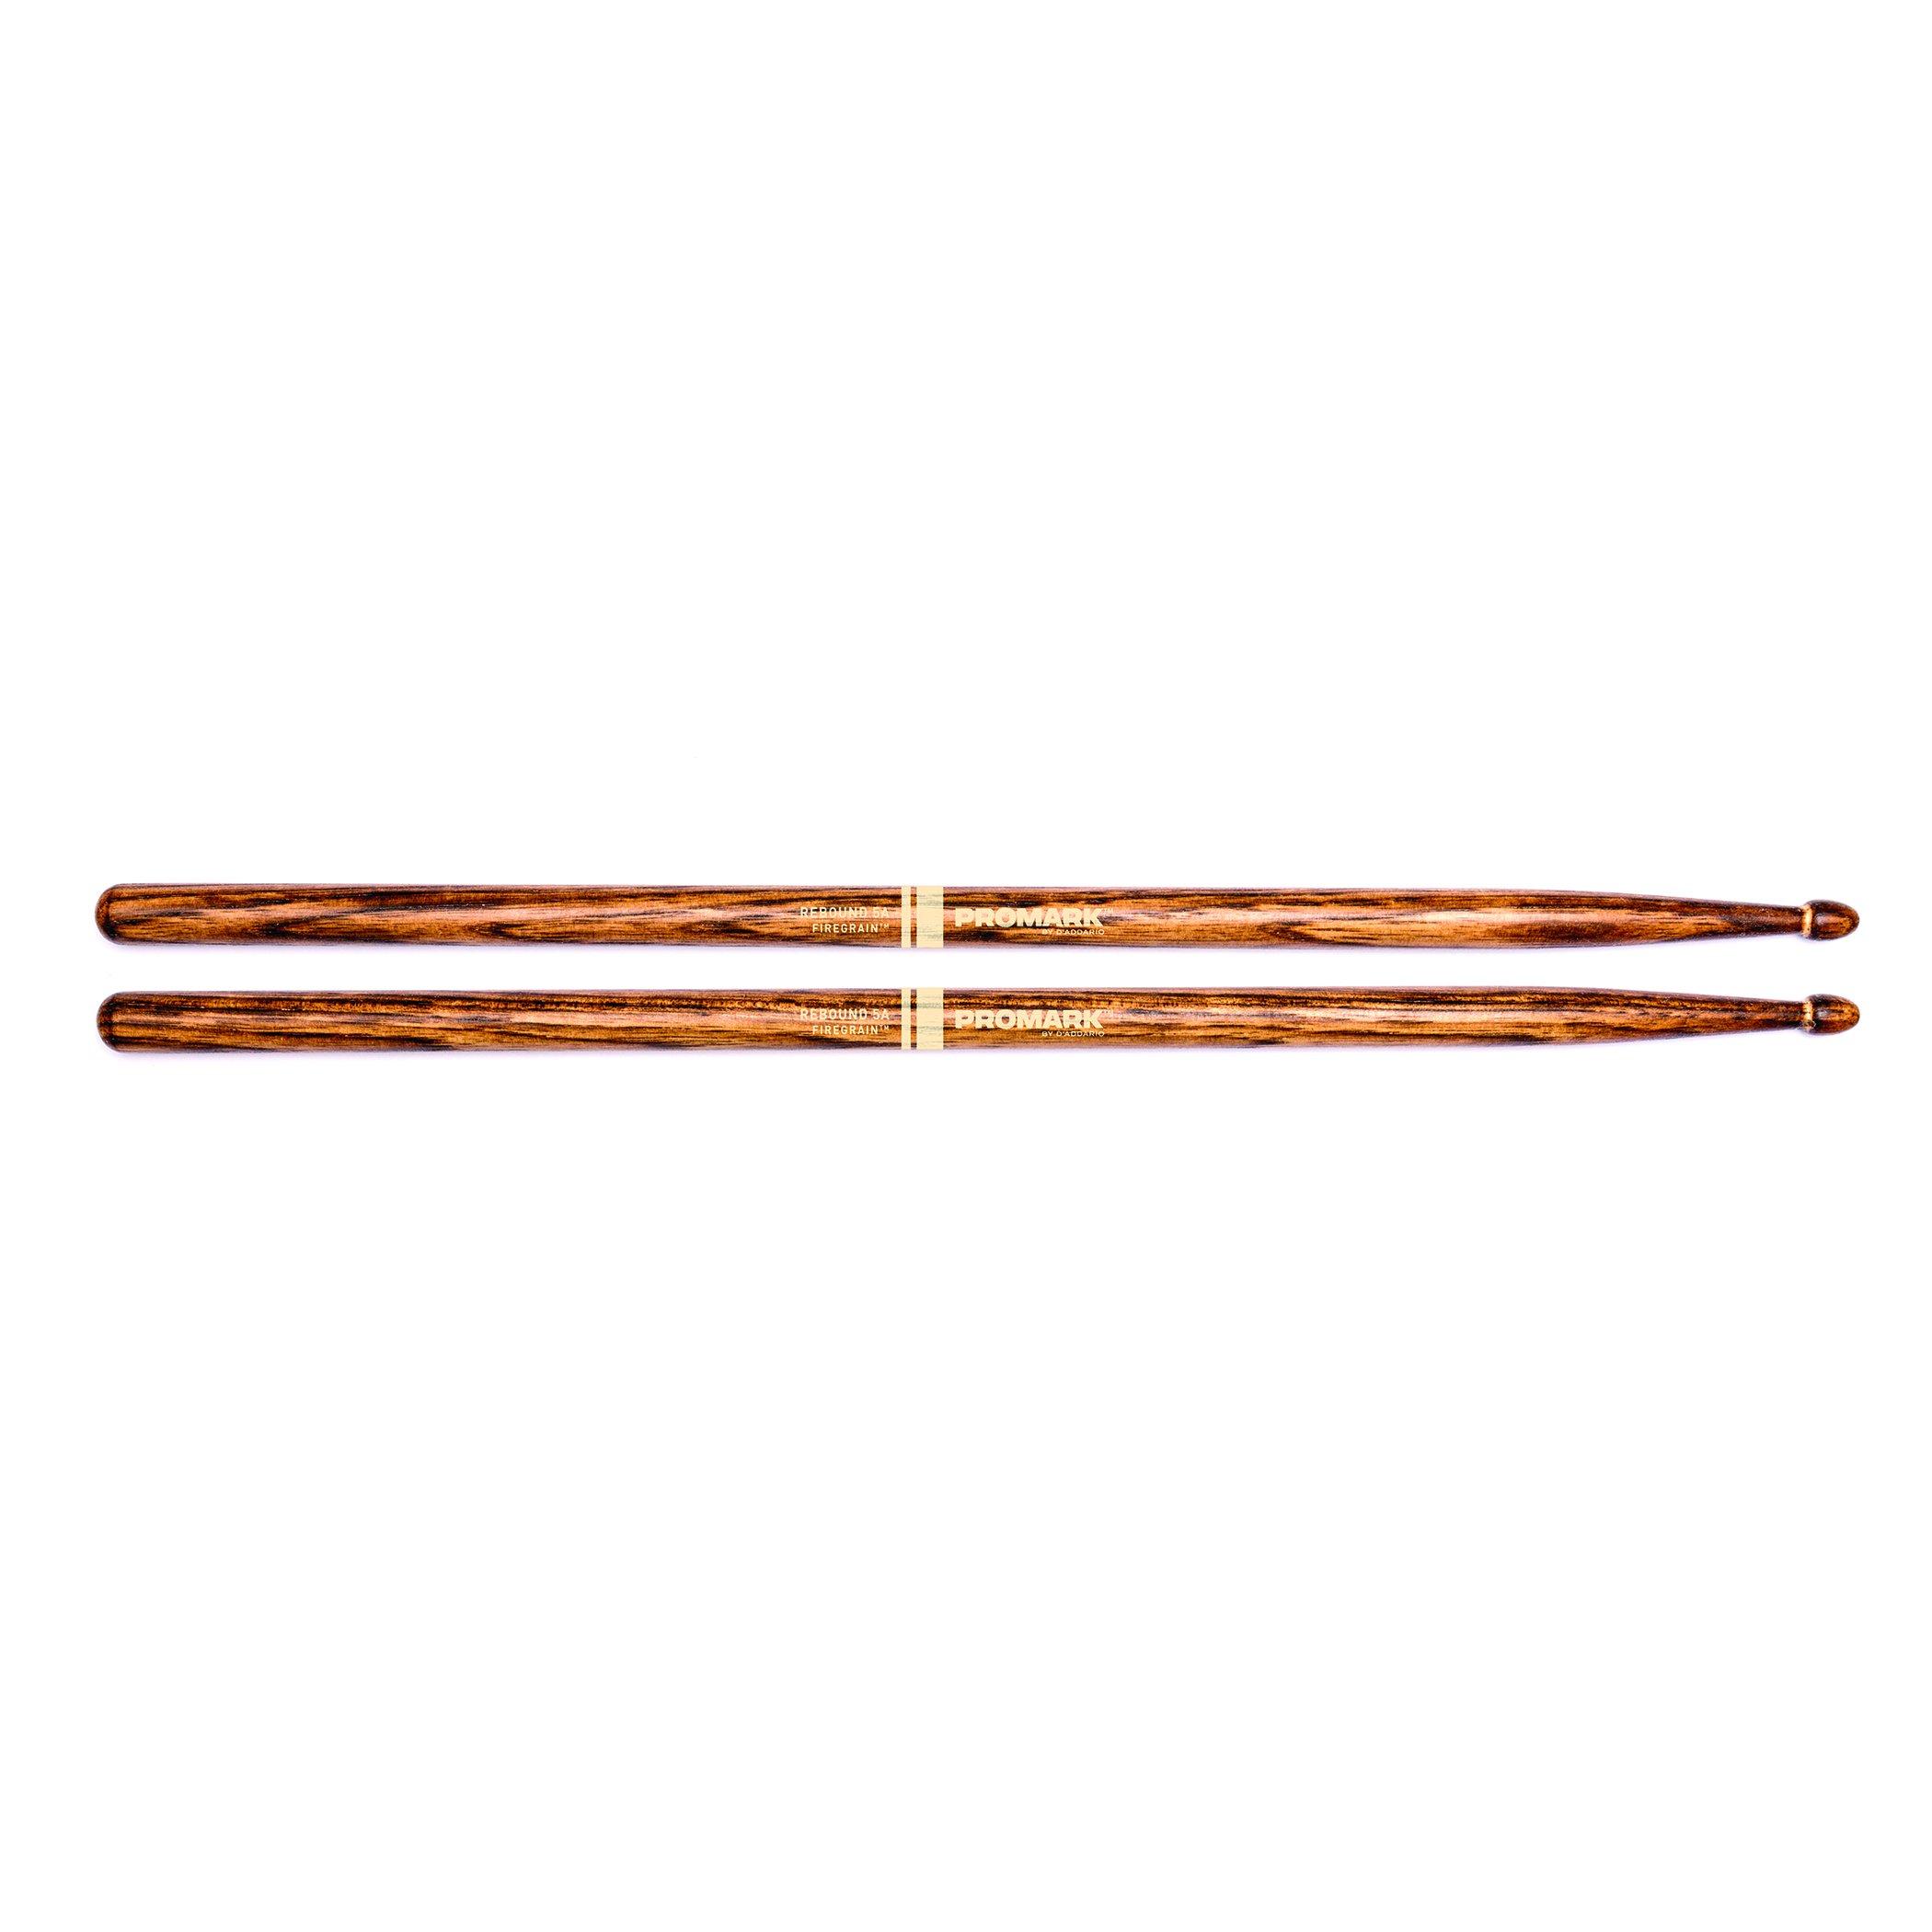 Promark FireGrain Rebound 5A Drumsticks, Acorn Tip